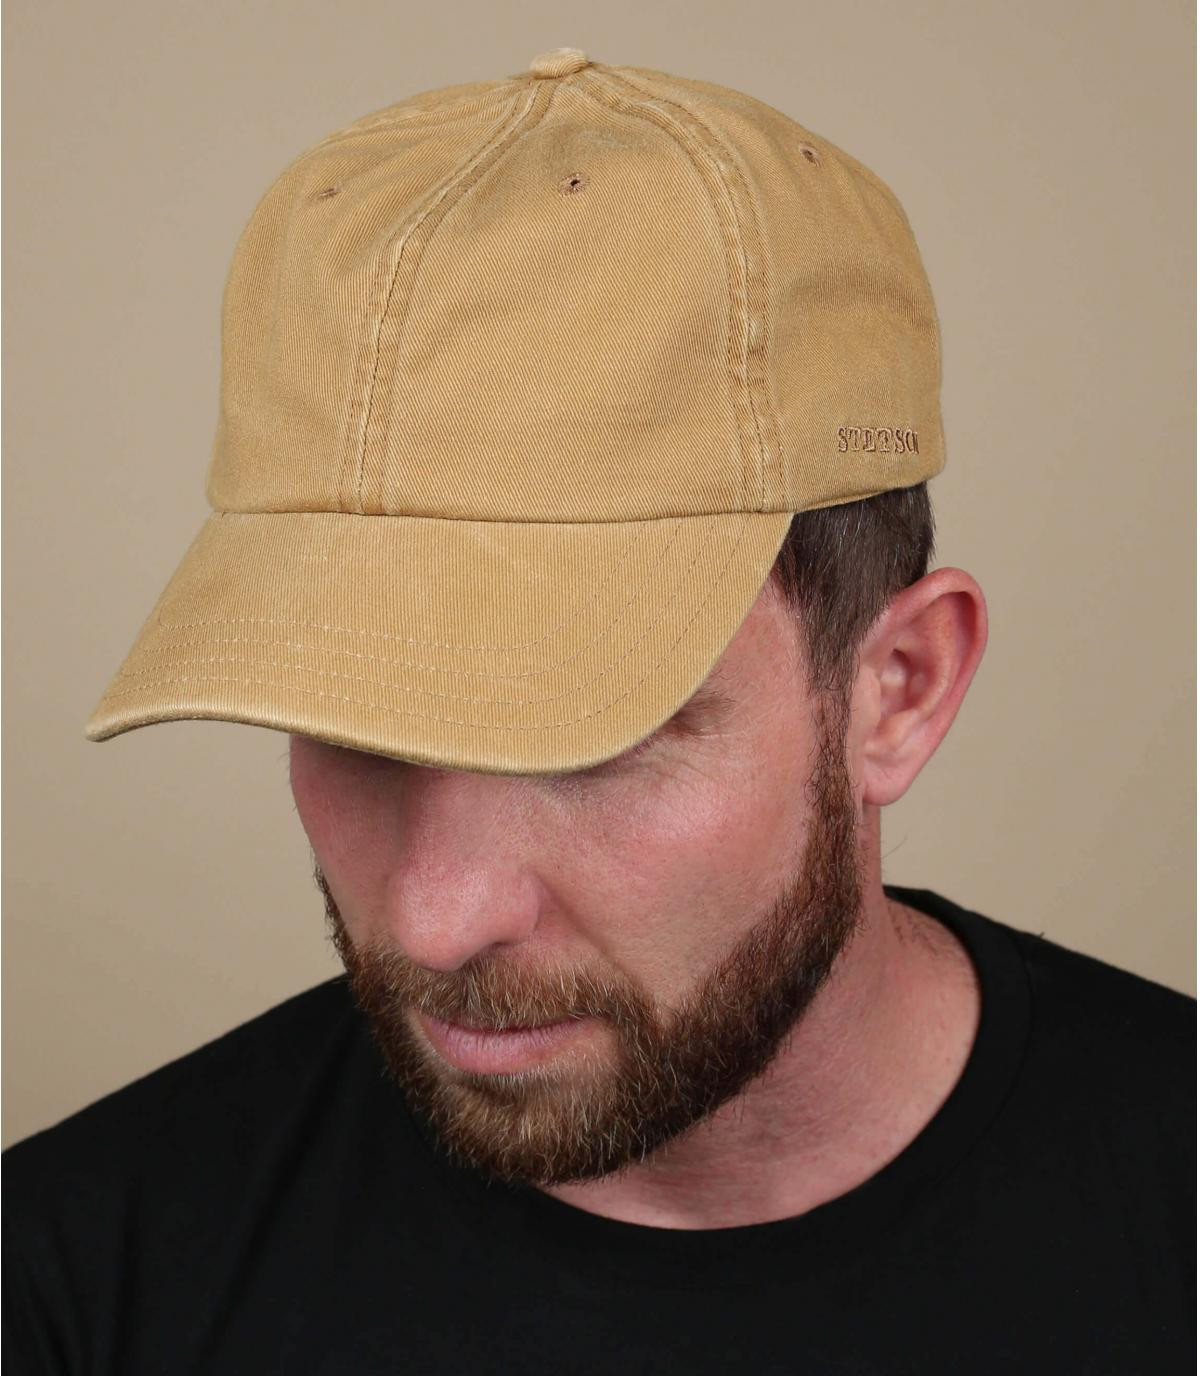 Cappellino baseball beige uomo